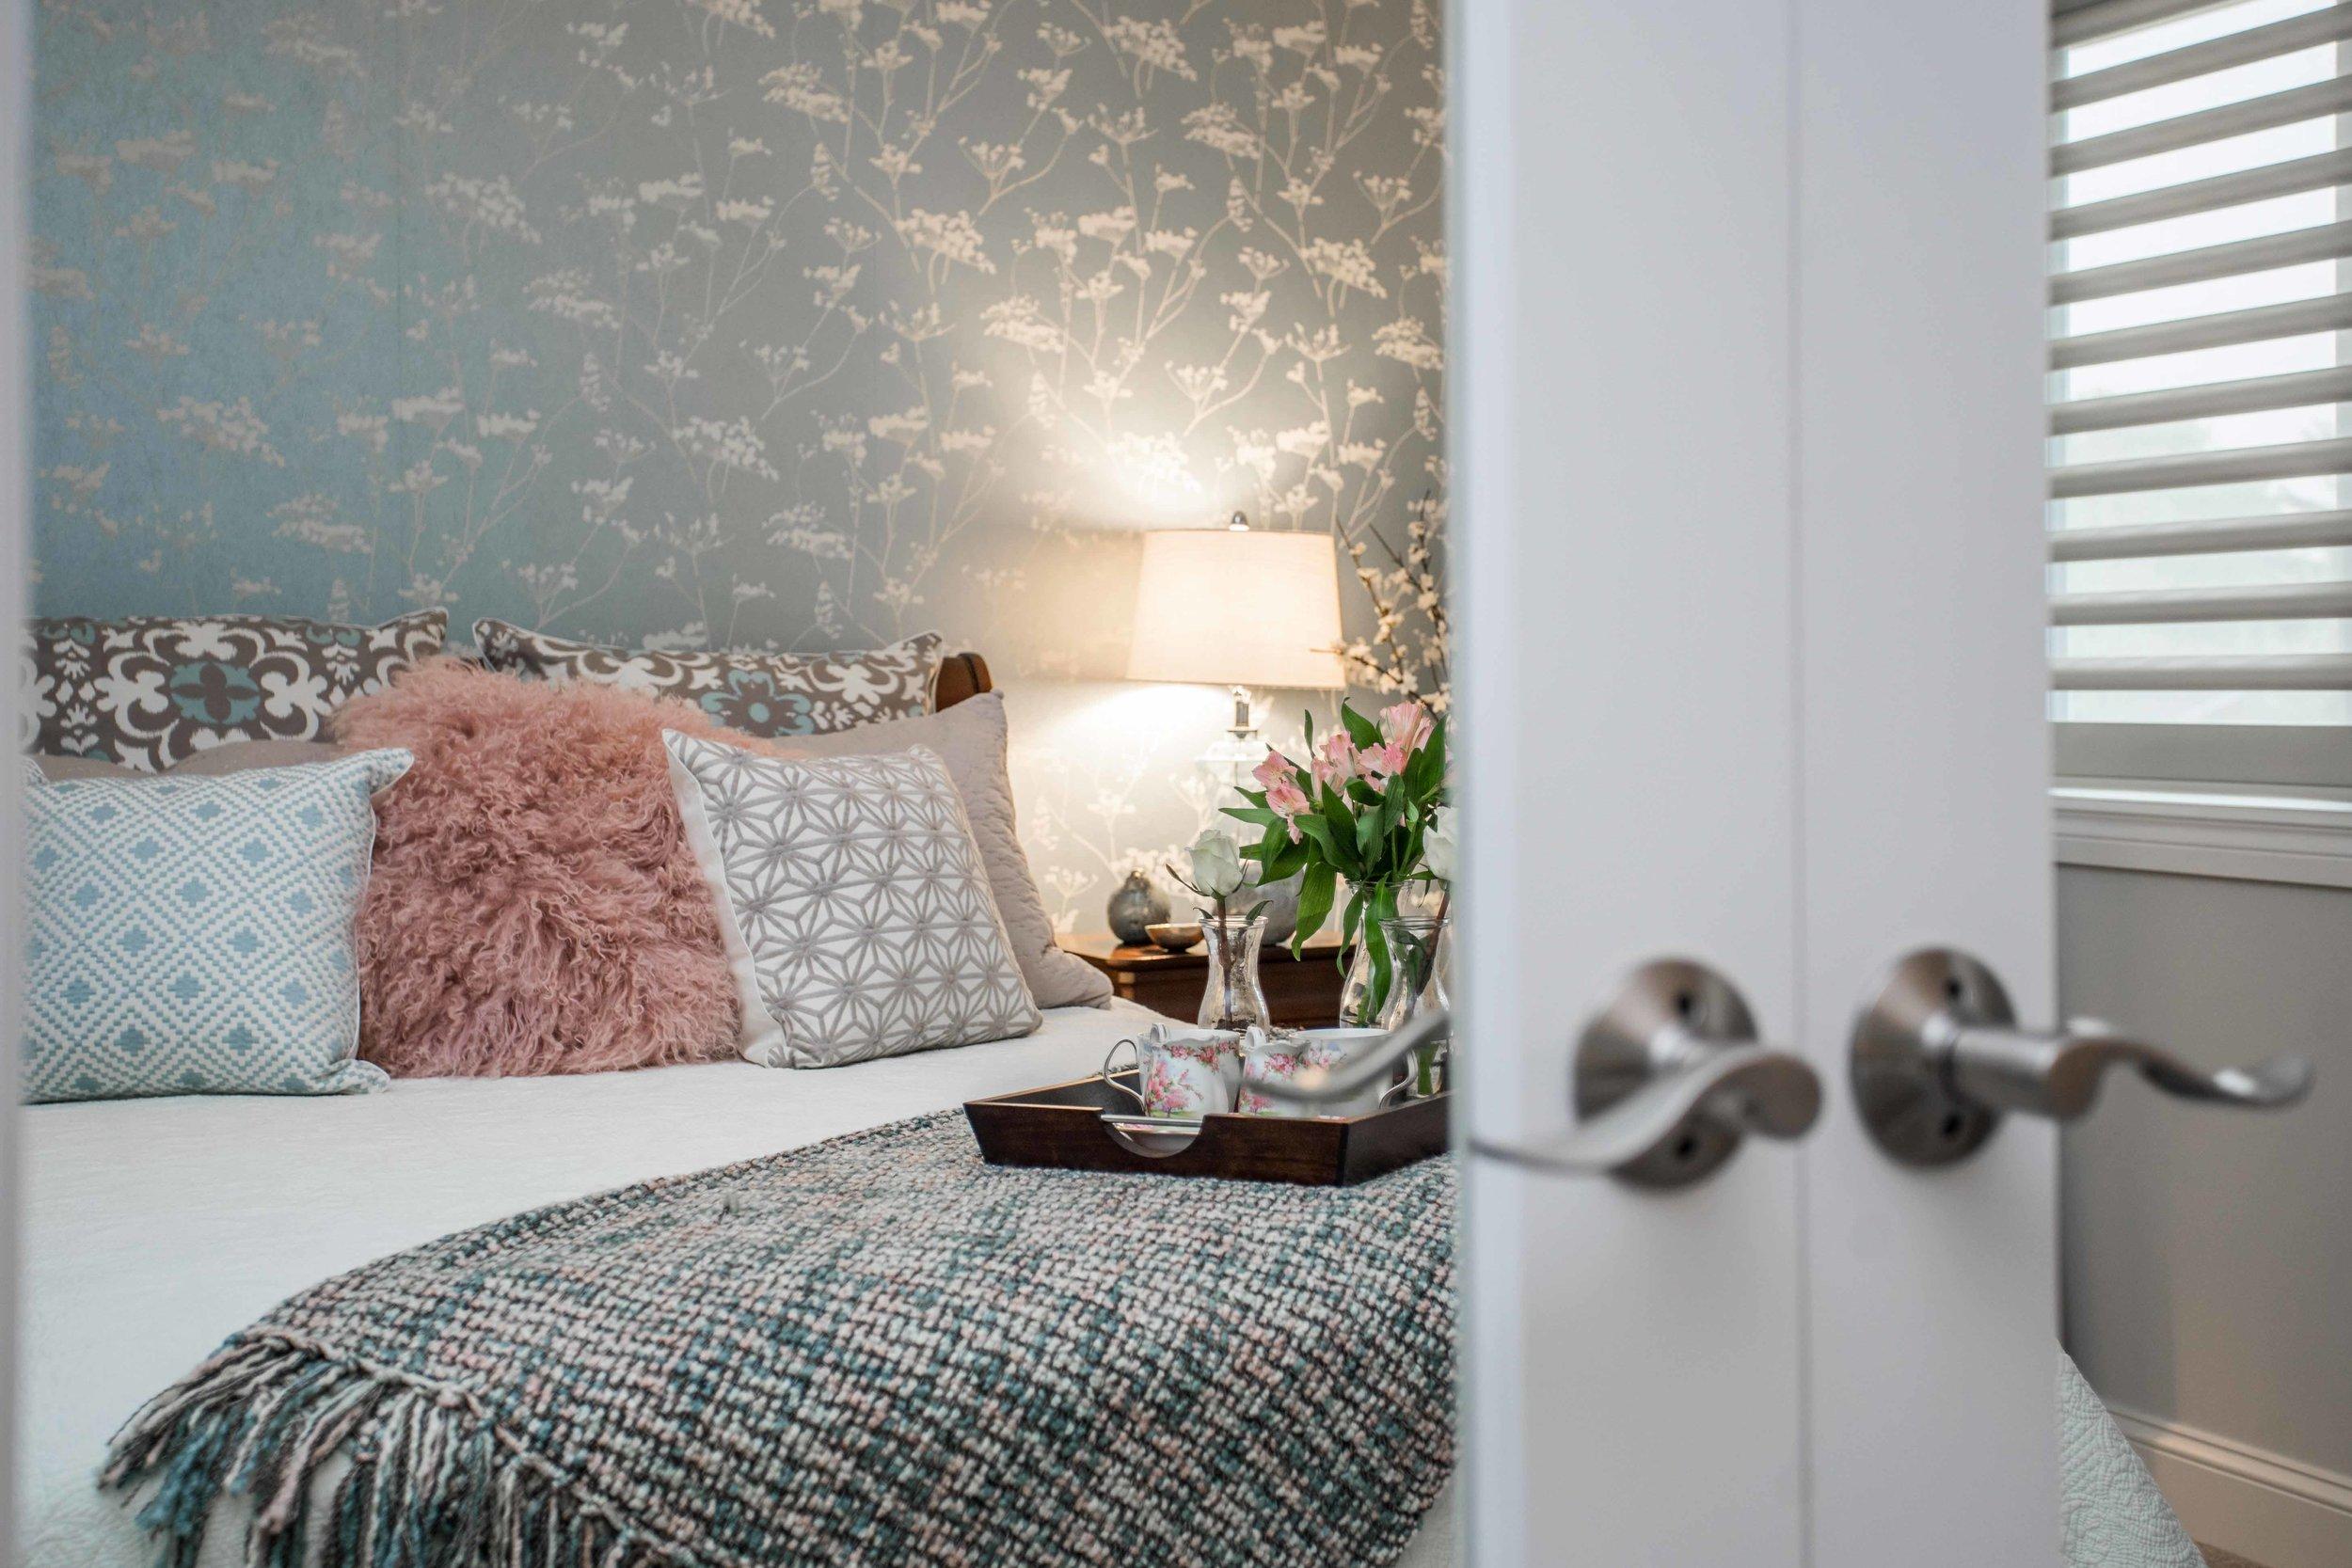 Picturesk-RL-Appelquist Bedrooms-3.jpg